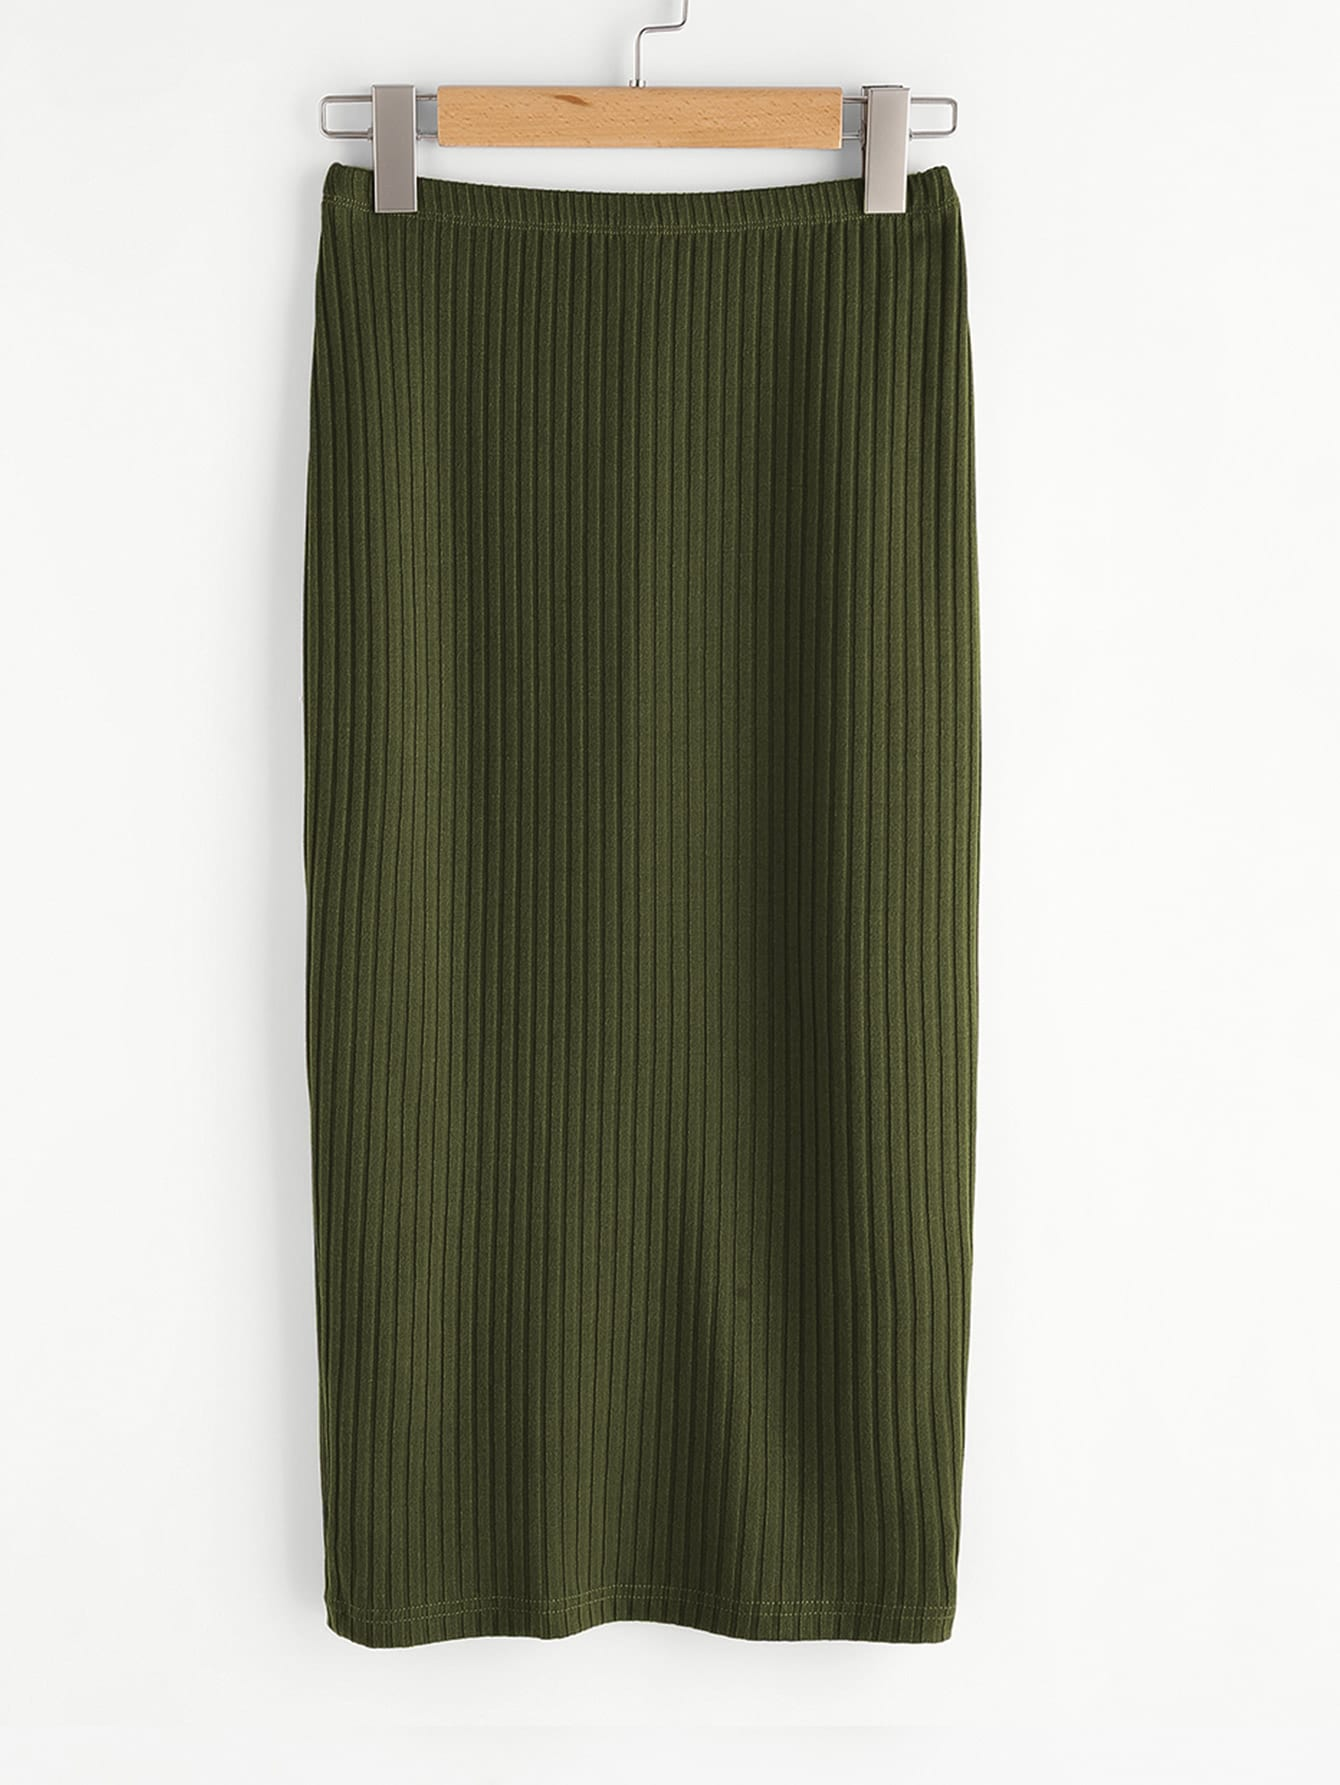 Elastic Waist Ribbed Pencil Skirt